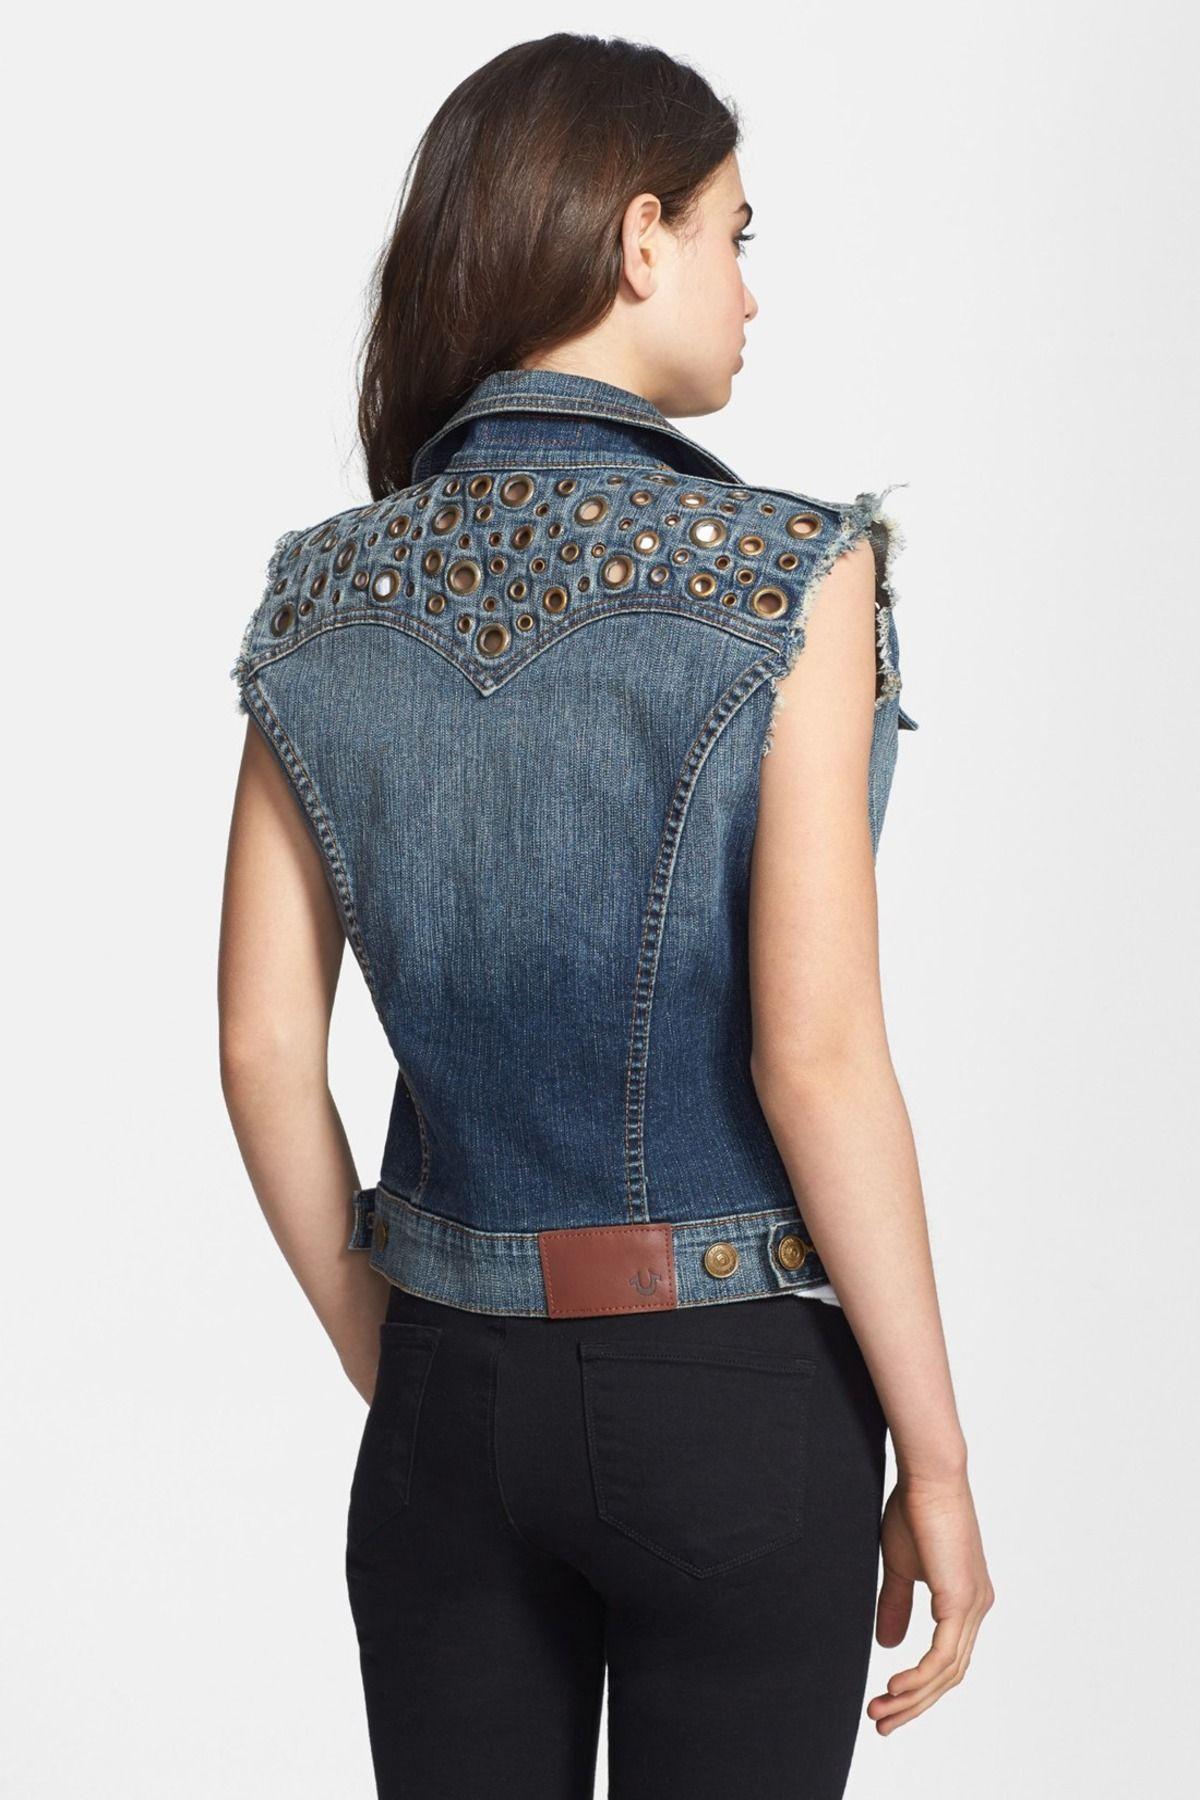 True Religion Brand Jeans 'Shelby' Embellished Denim